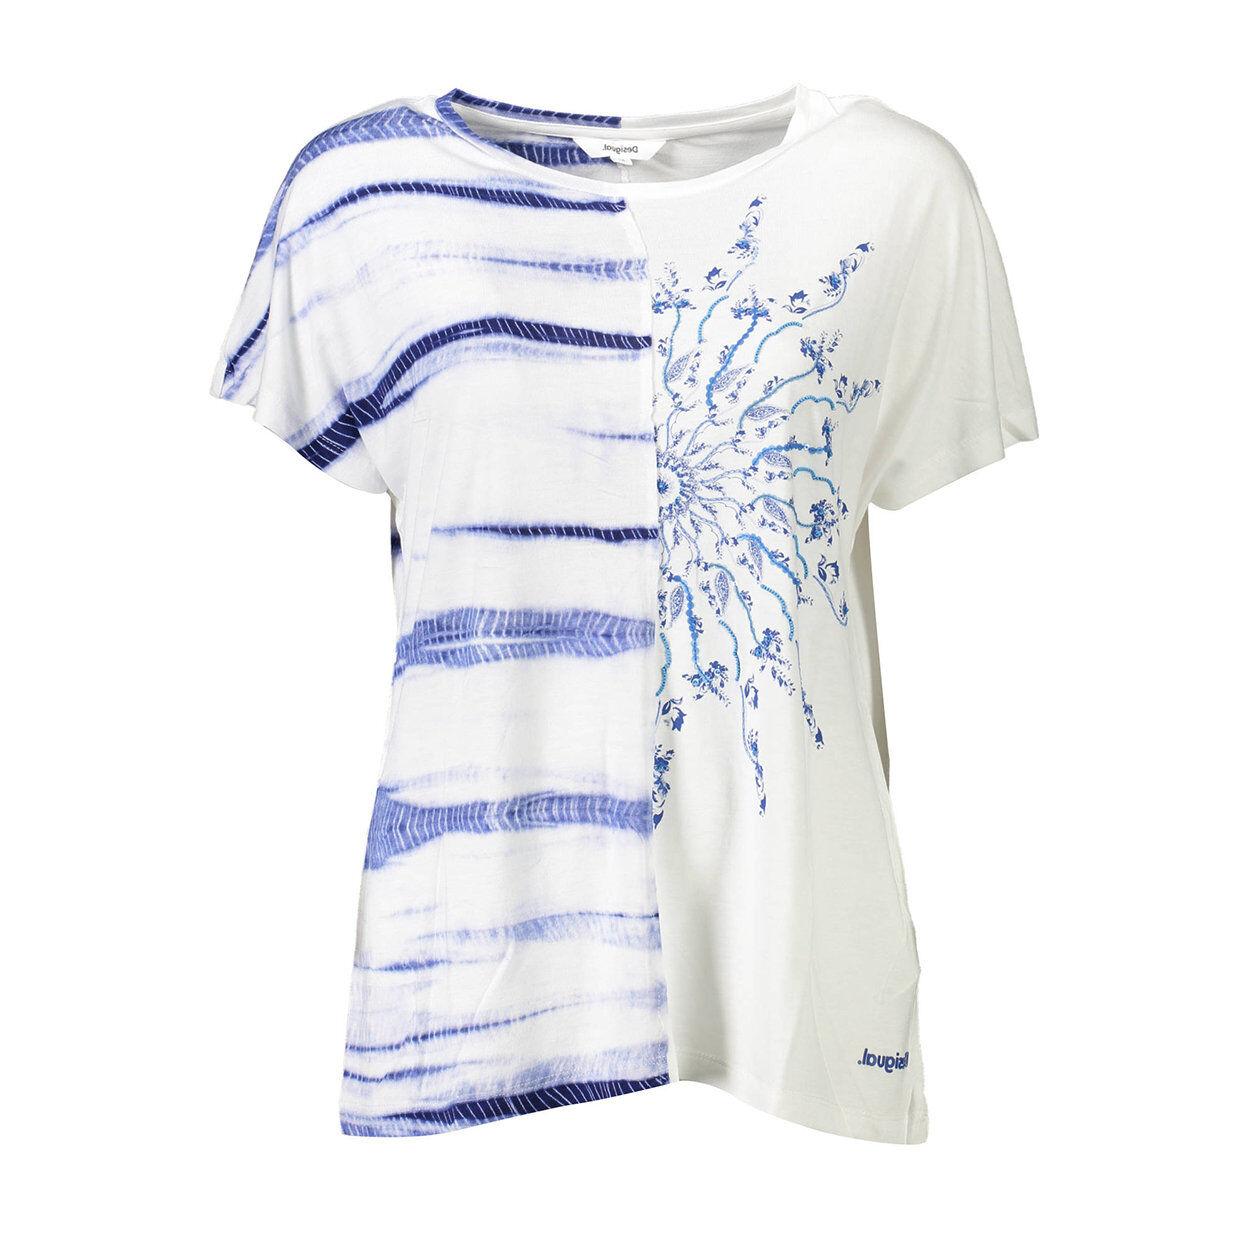 Desigual T-shirt bianca divisa da disegni aimmetrici